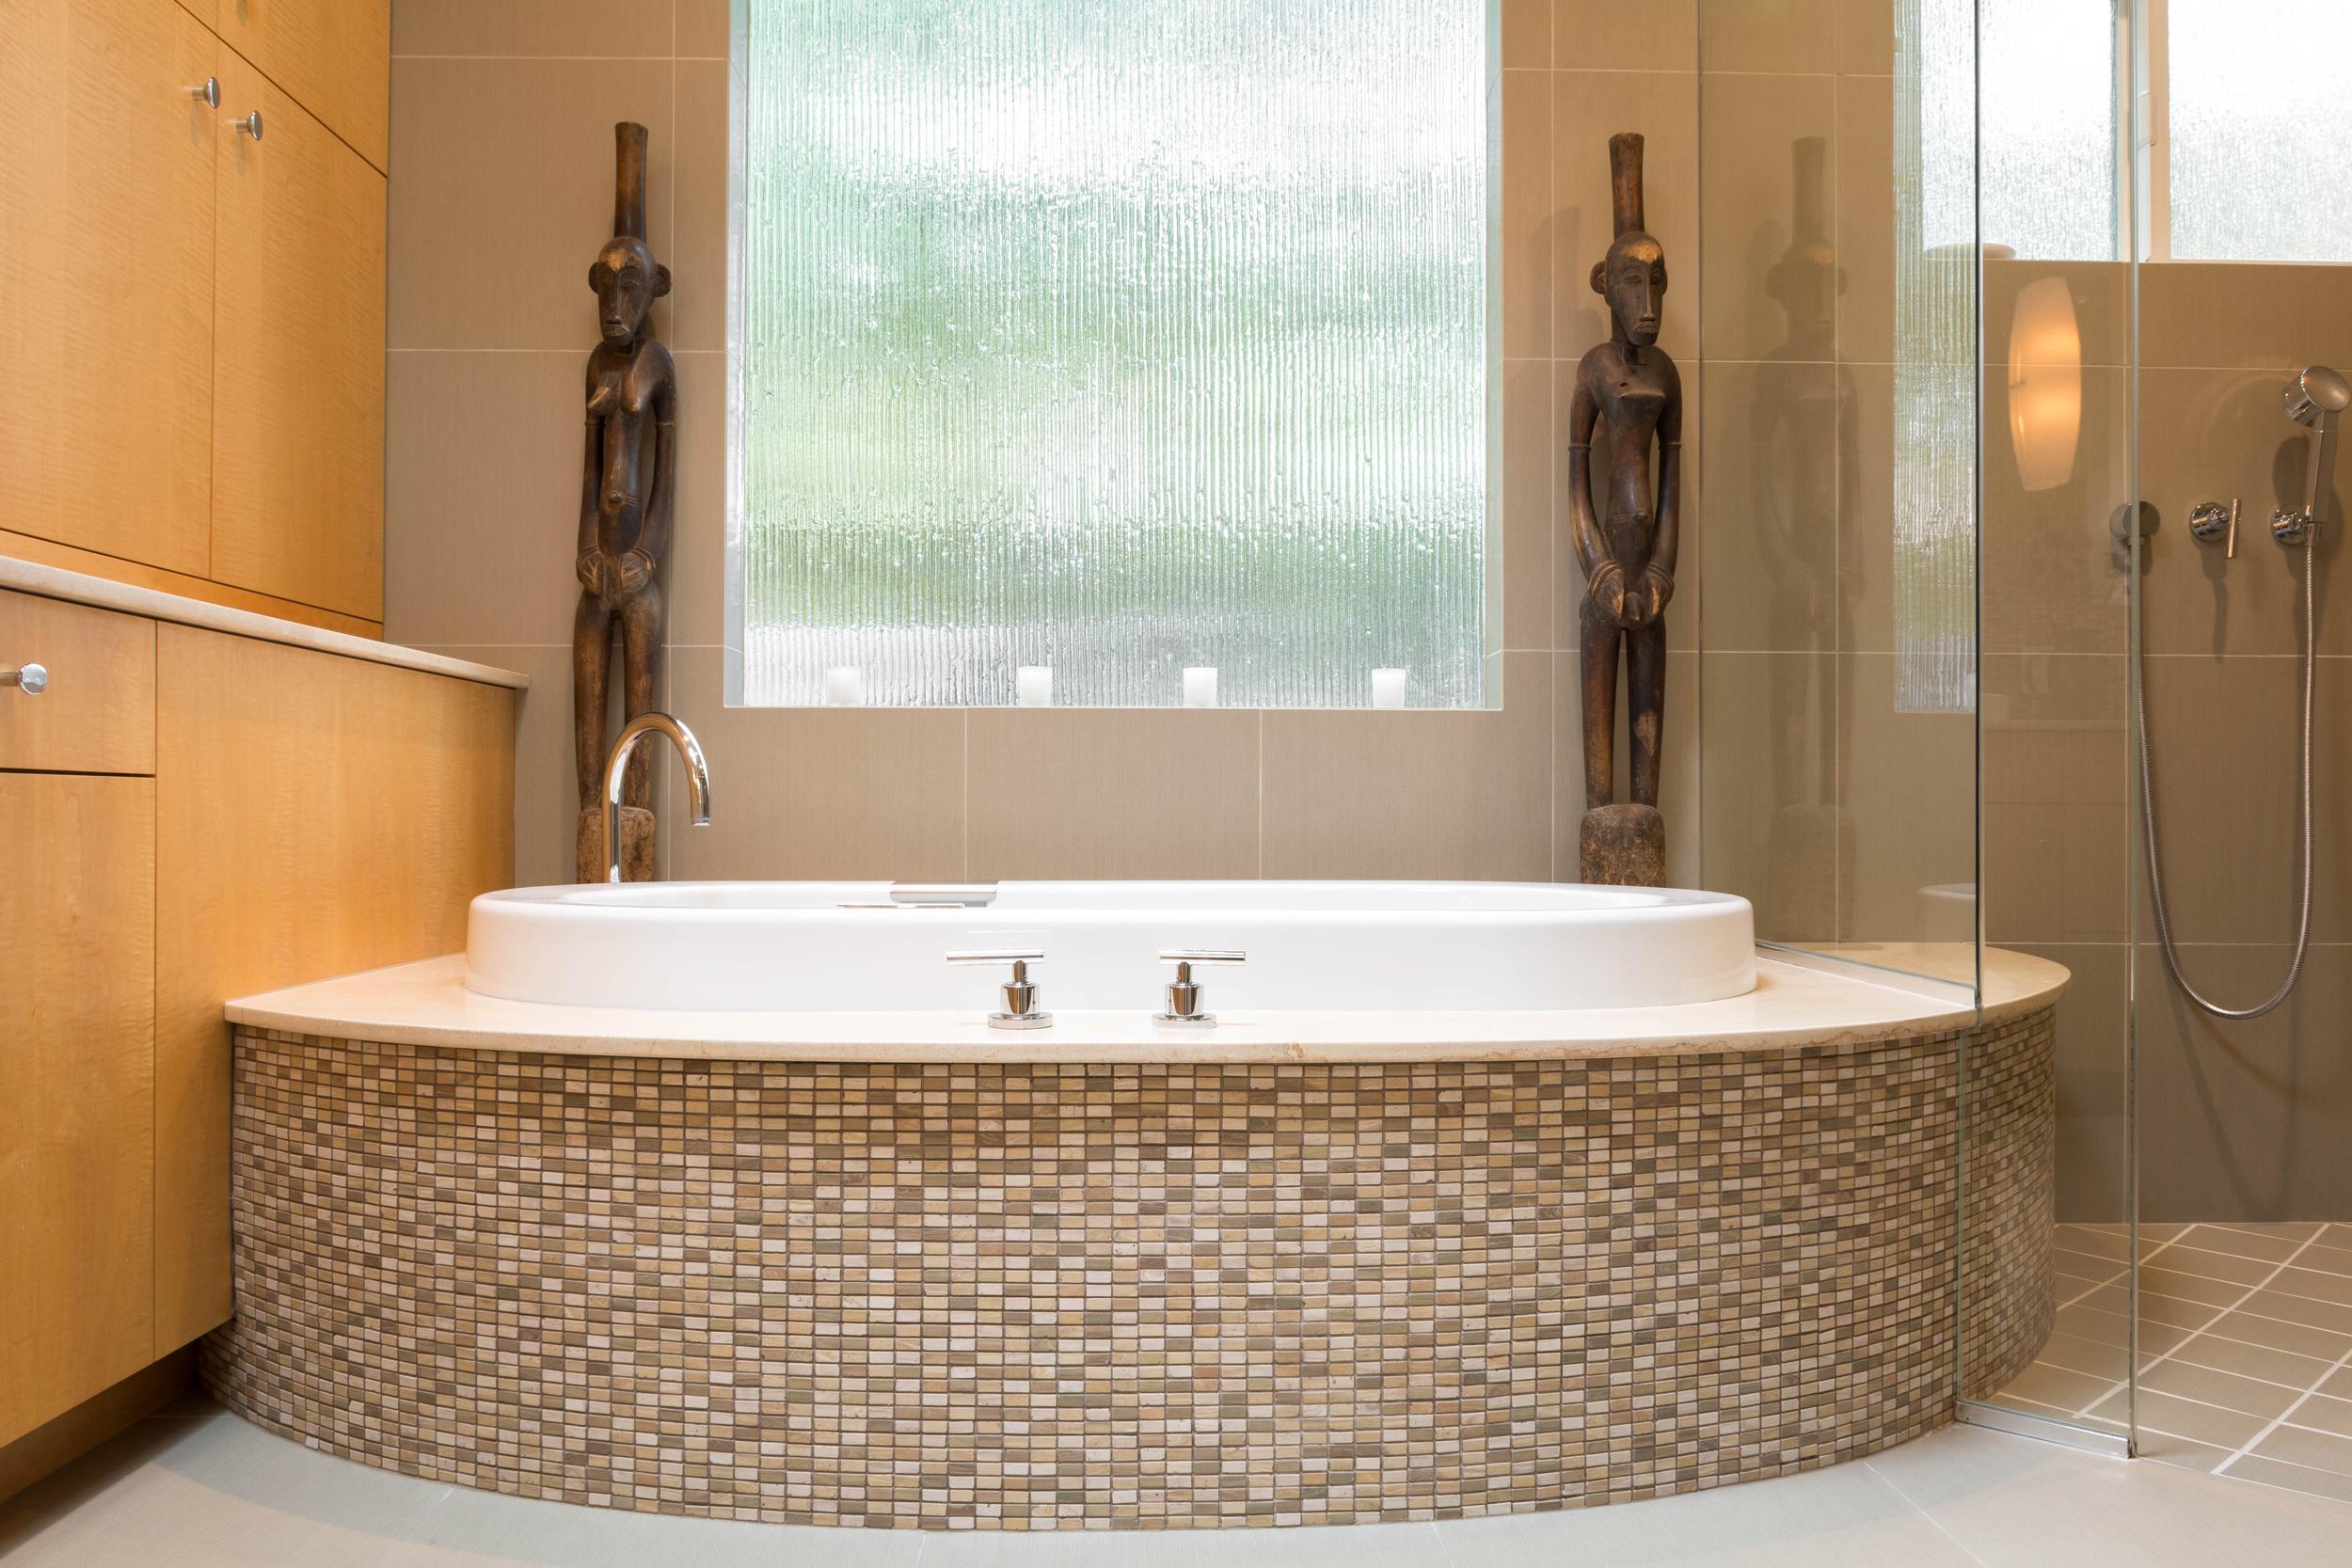 Claremont-Master-Suite-Builtin-Maple-Tile-Tub-Rain-Glass.jpg